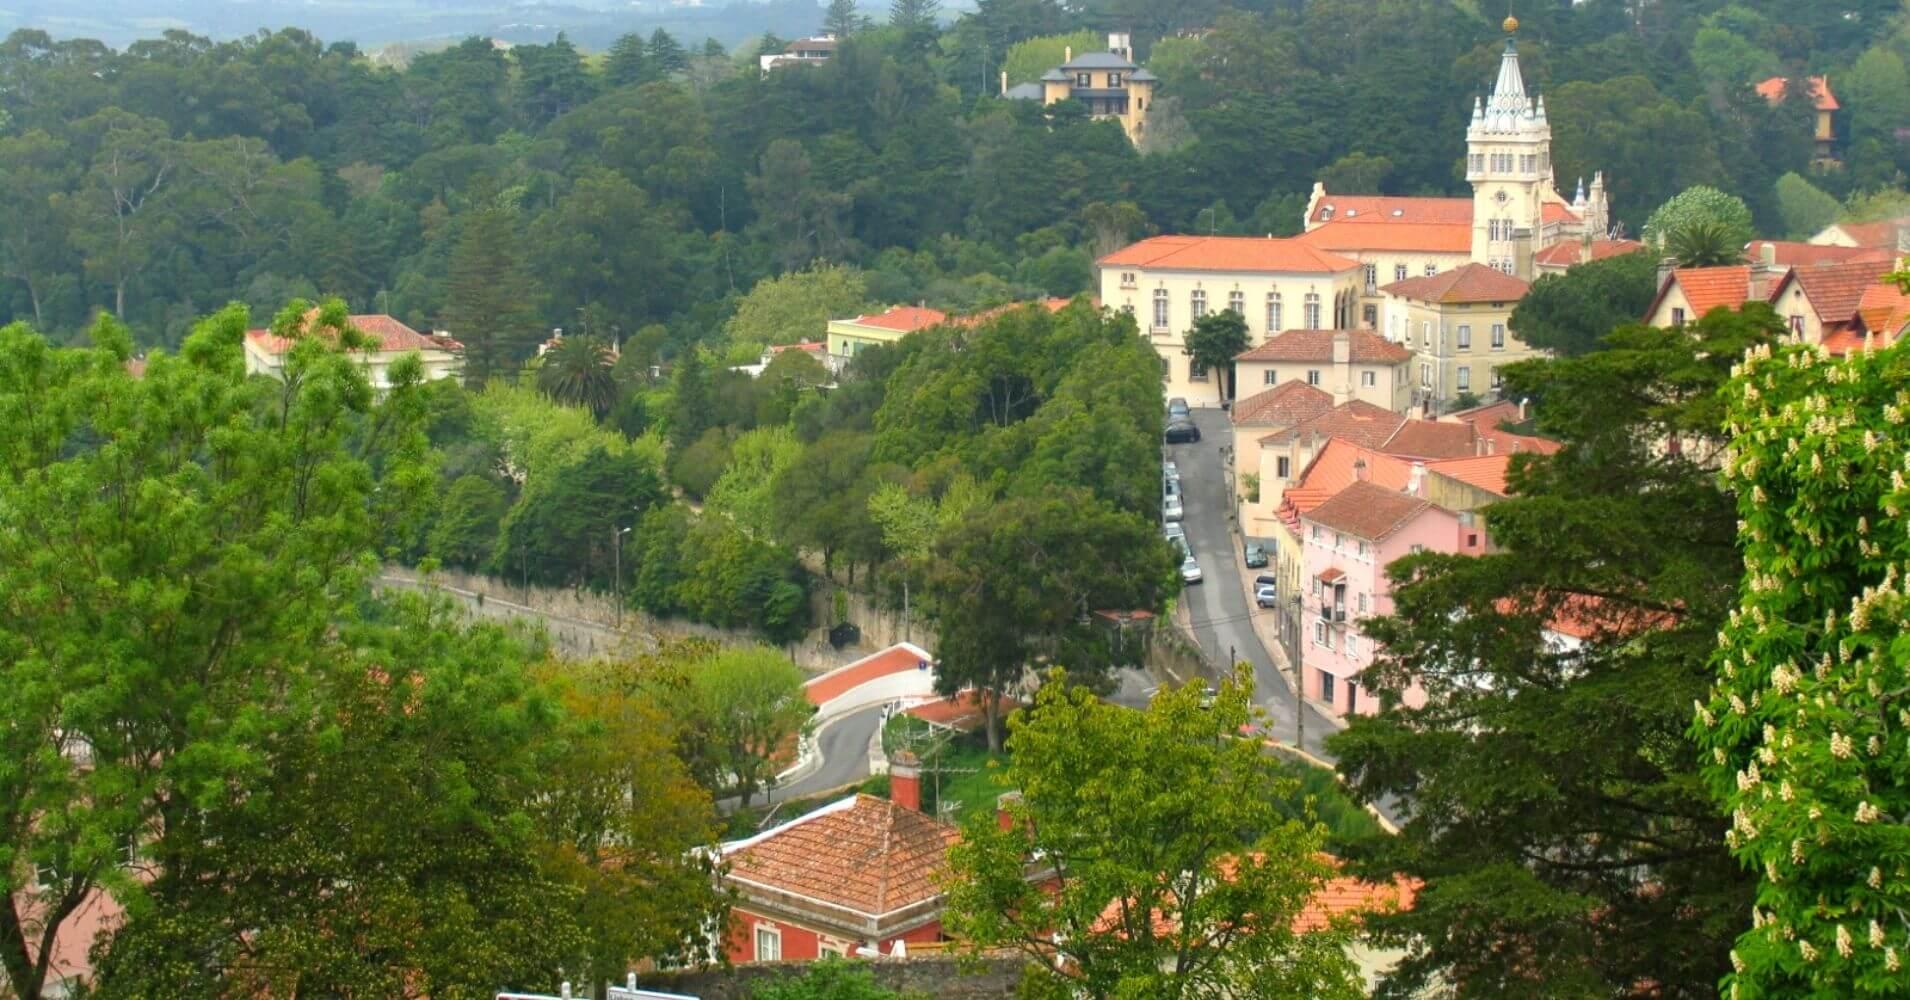 Sintra, Parque Natural Sintra-Cascais. Portugal.